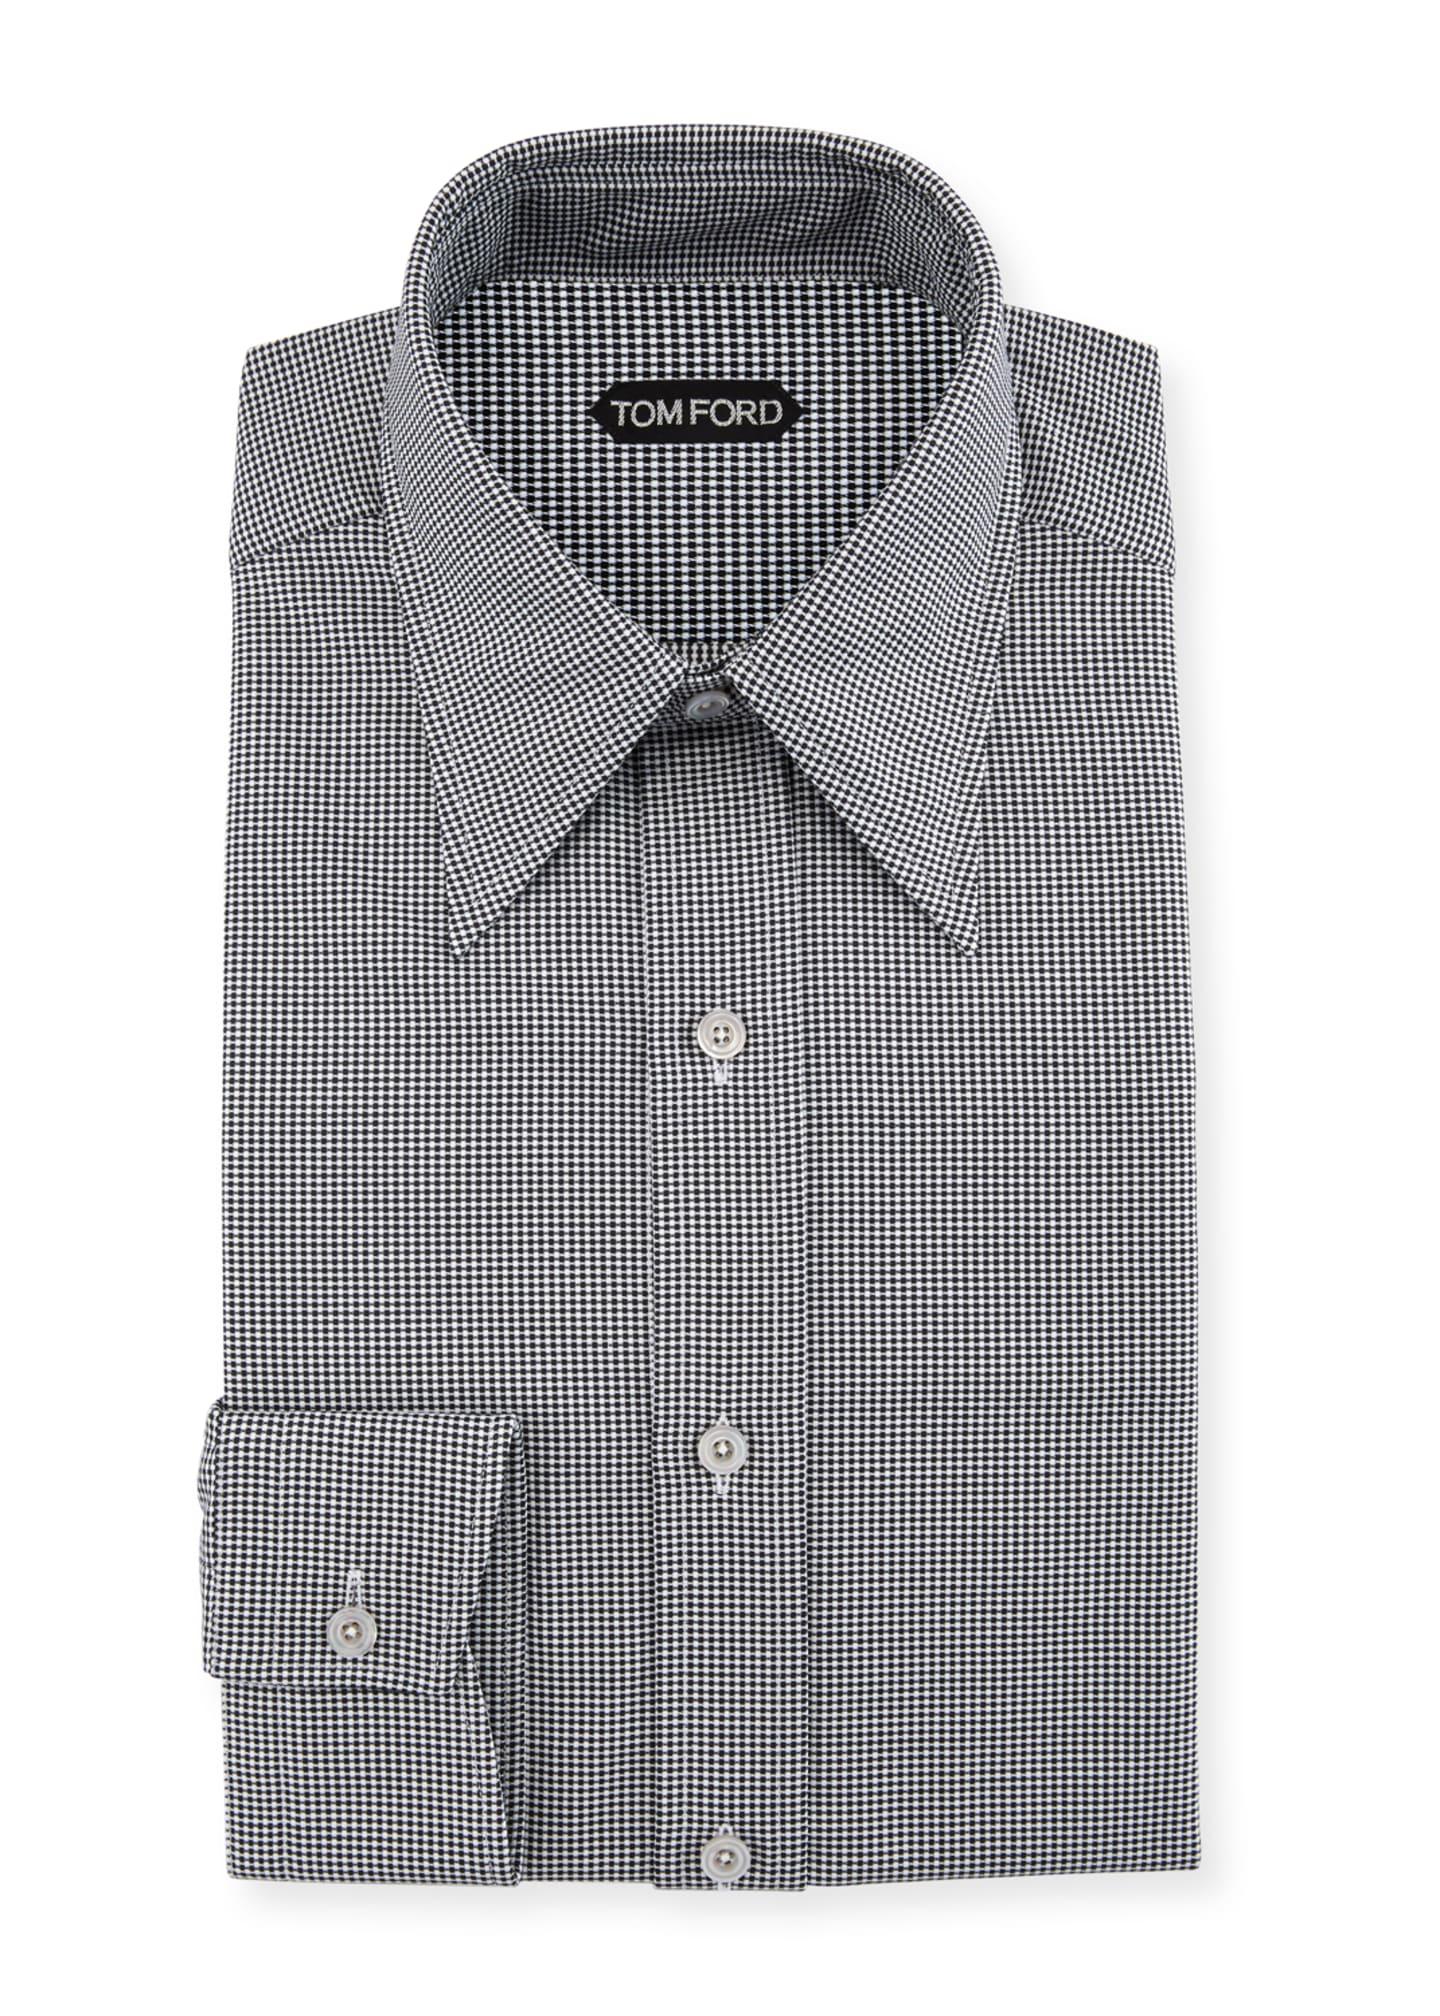 TOM FORD Men's Hopsack Pointed-Collar Dress Shirt